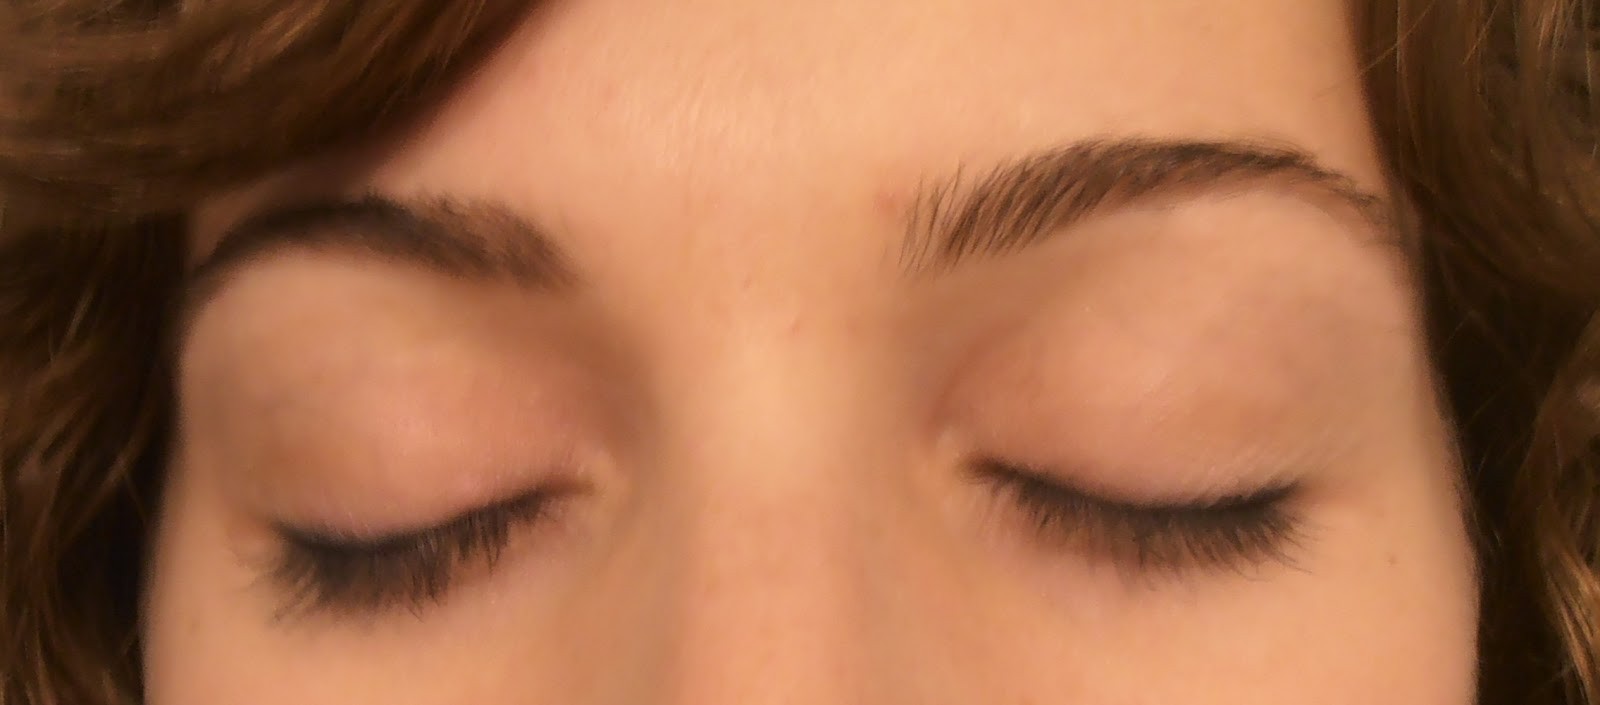 Eye Majic: Sweep on Eyeshadow Review | Toronto Beauty Reviews